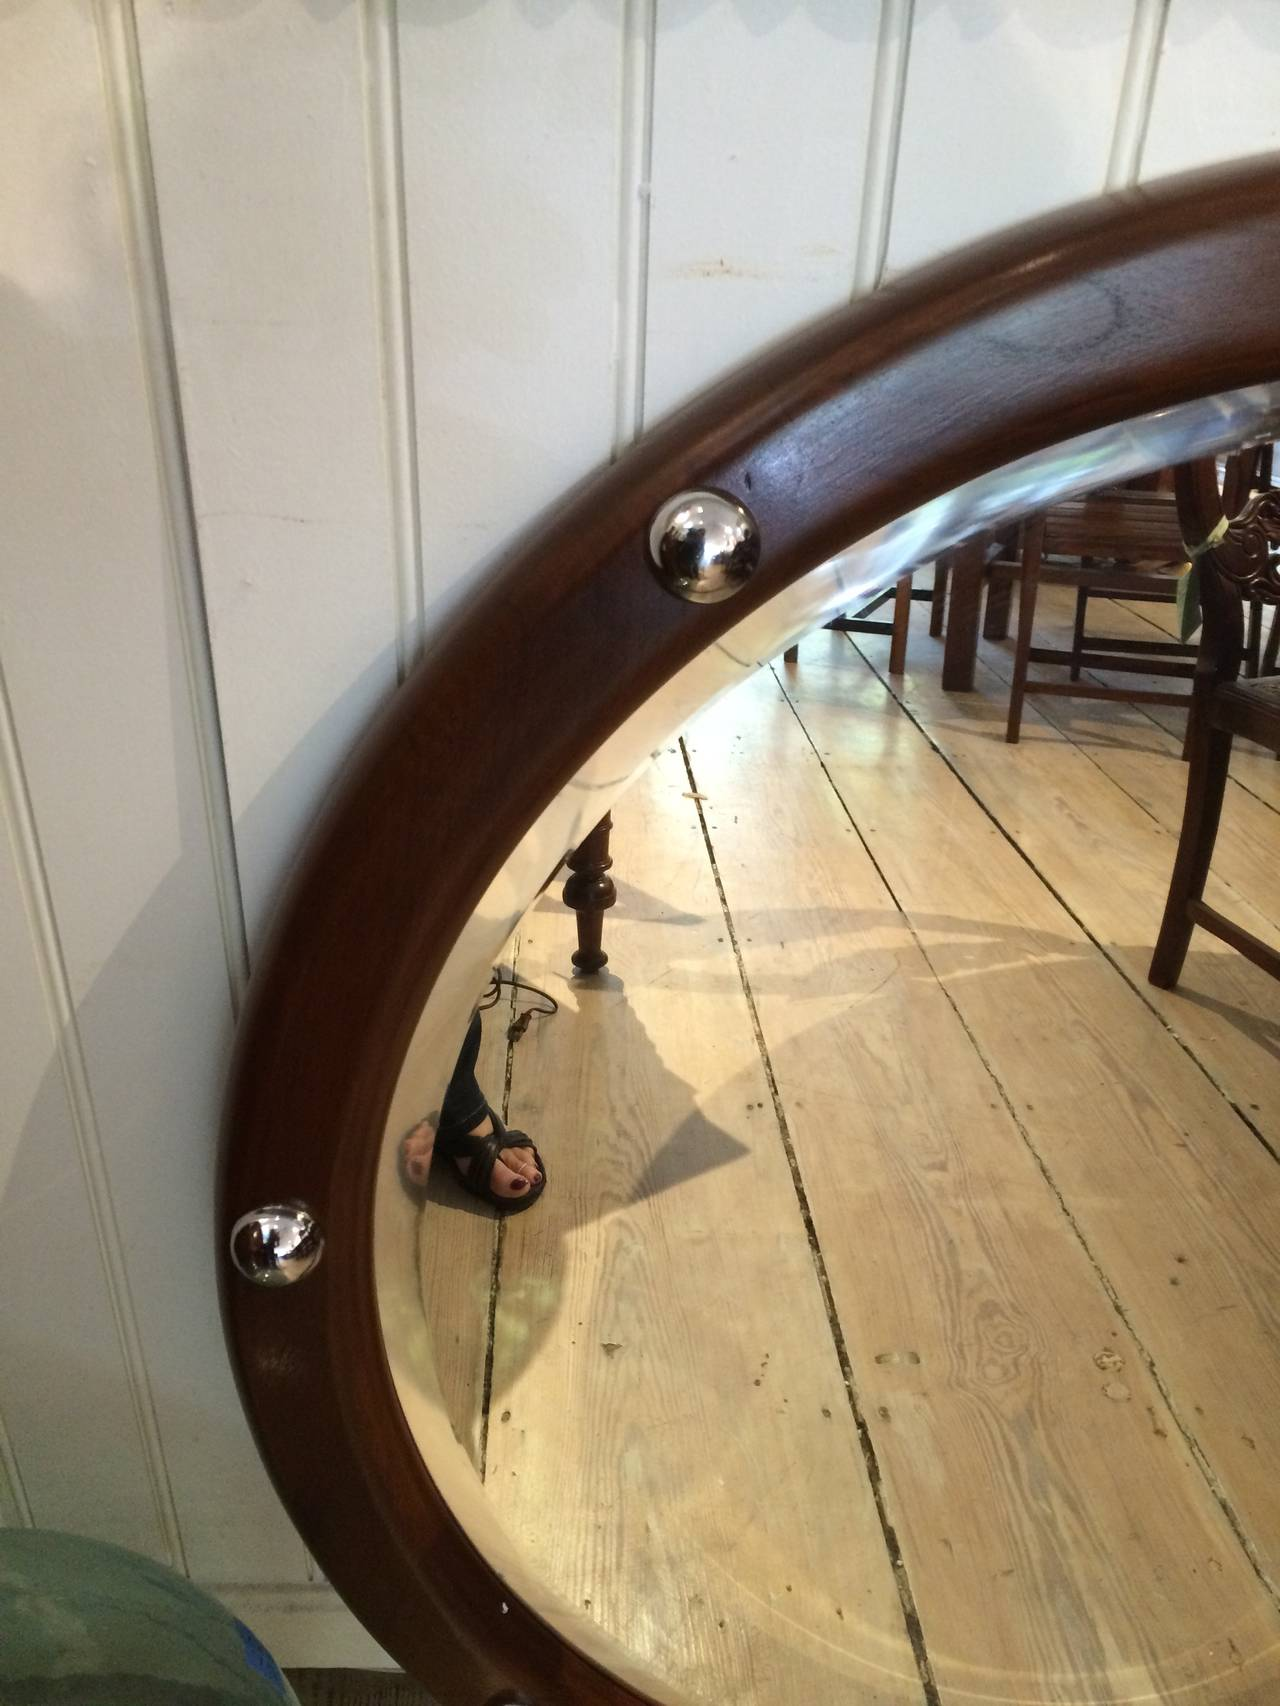 Beveled Teak and Chrome Ship's Stateroom Mirror, Mid-Century